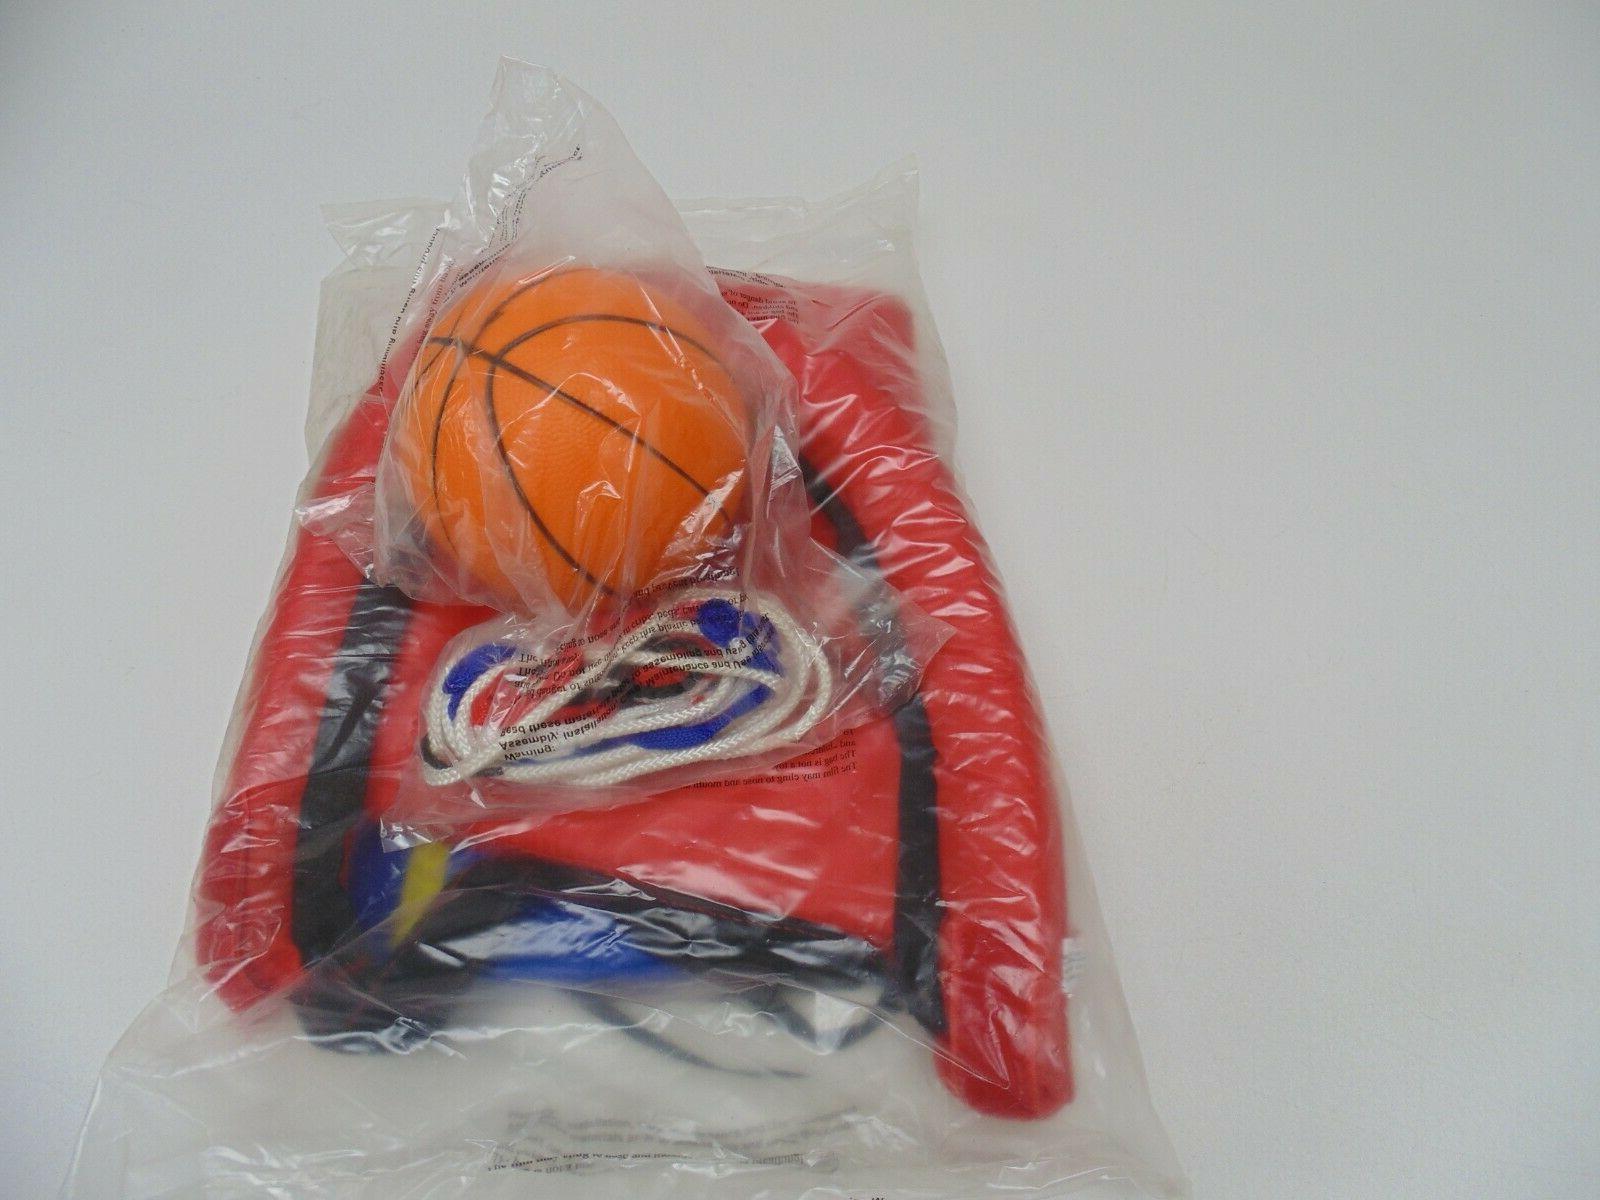 Skywalker Trampolines Basketball and Ball